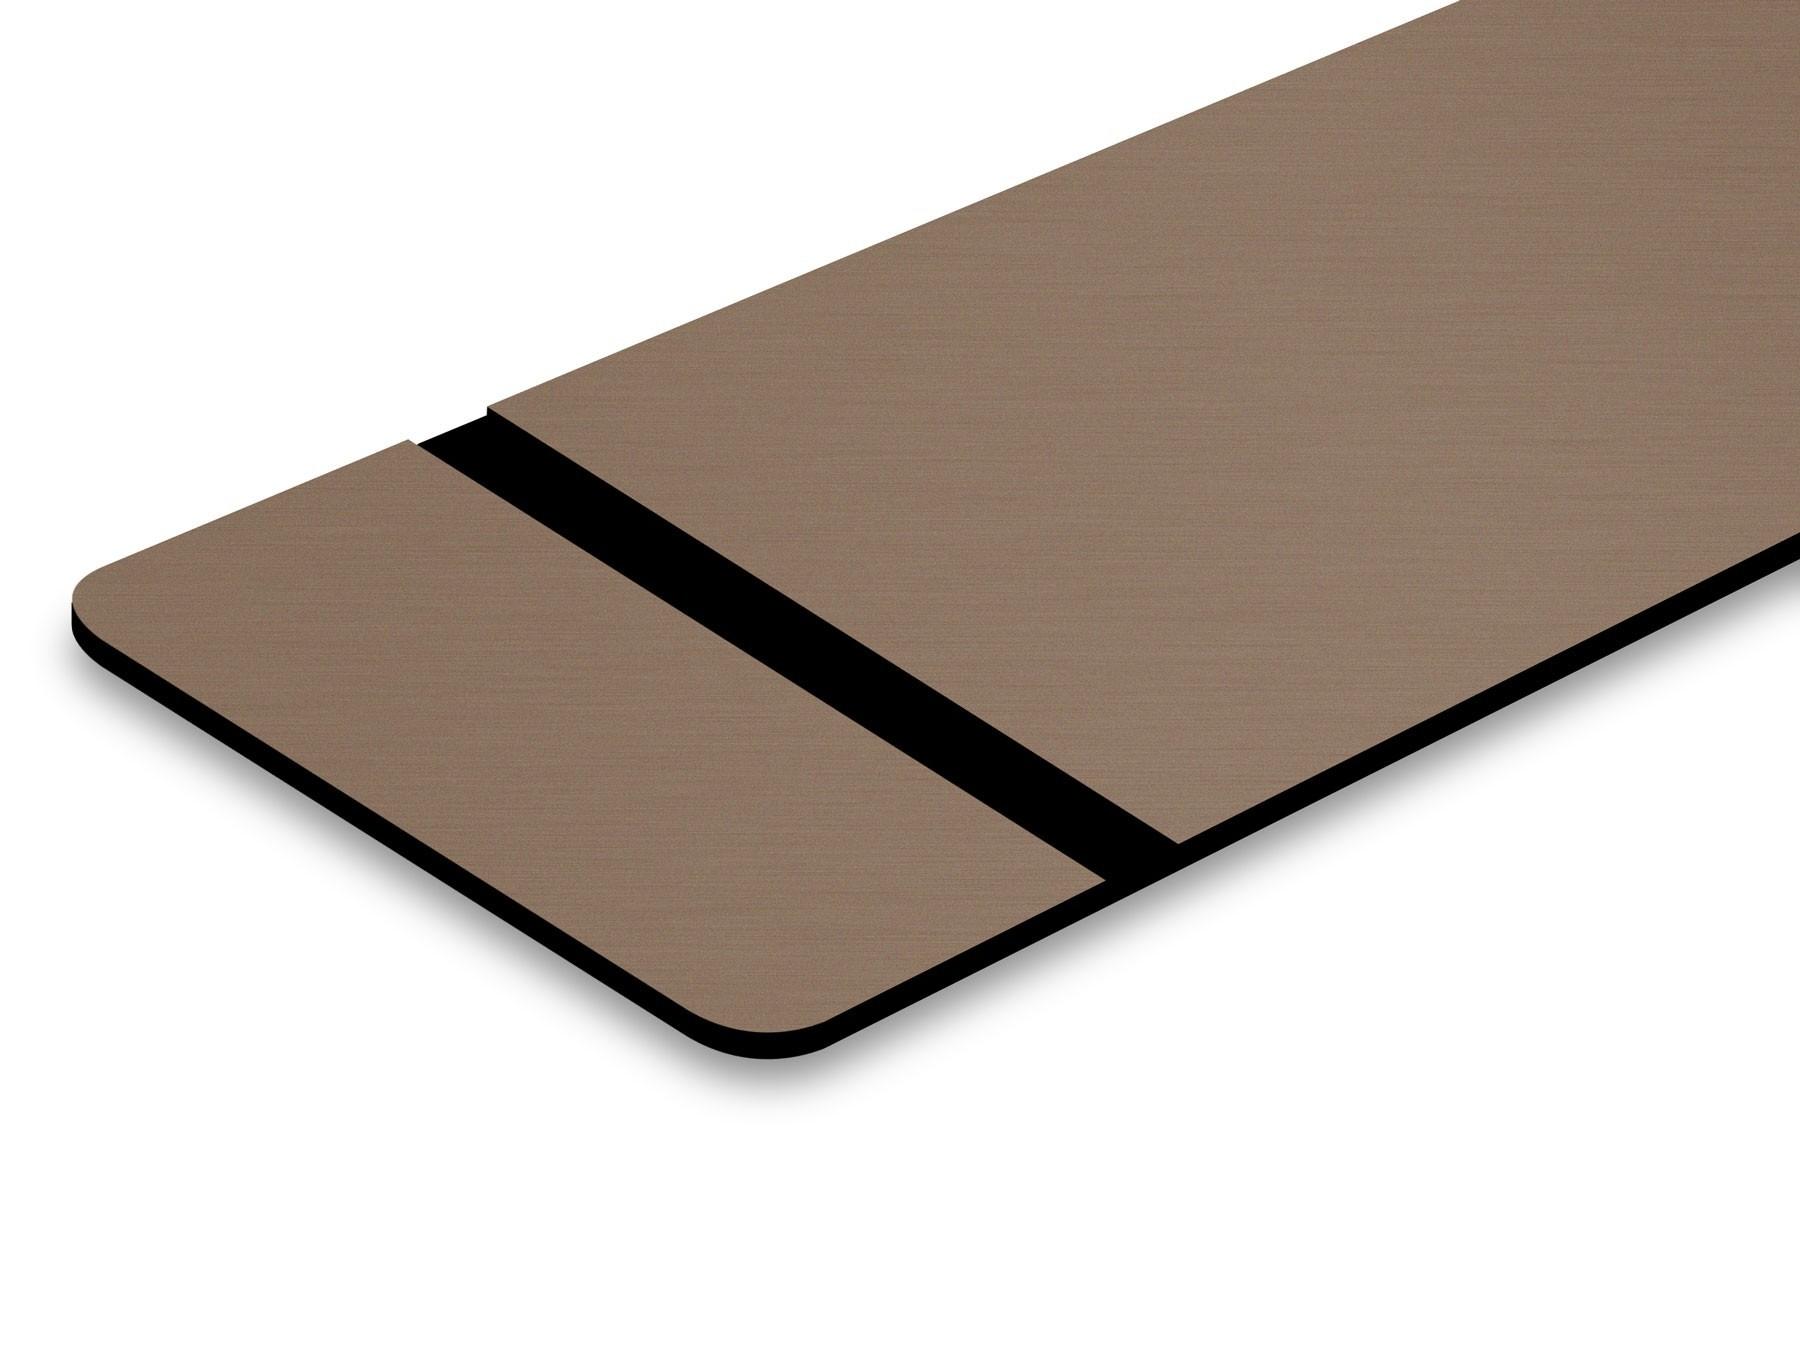 TroLase Thins, Deep Bronze/Black, 2ply, 0.5 mm